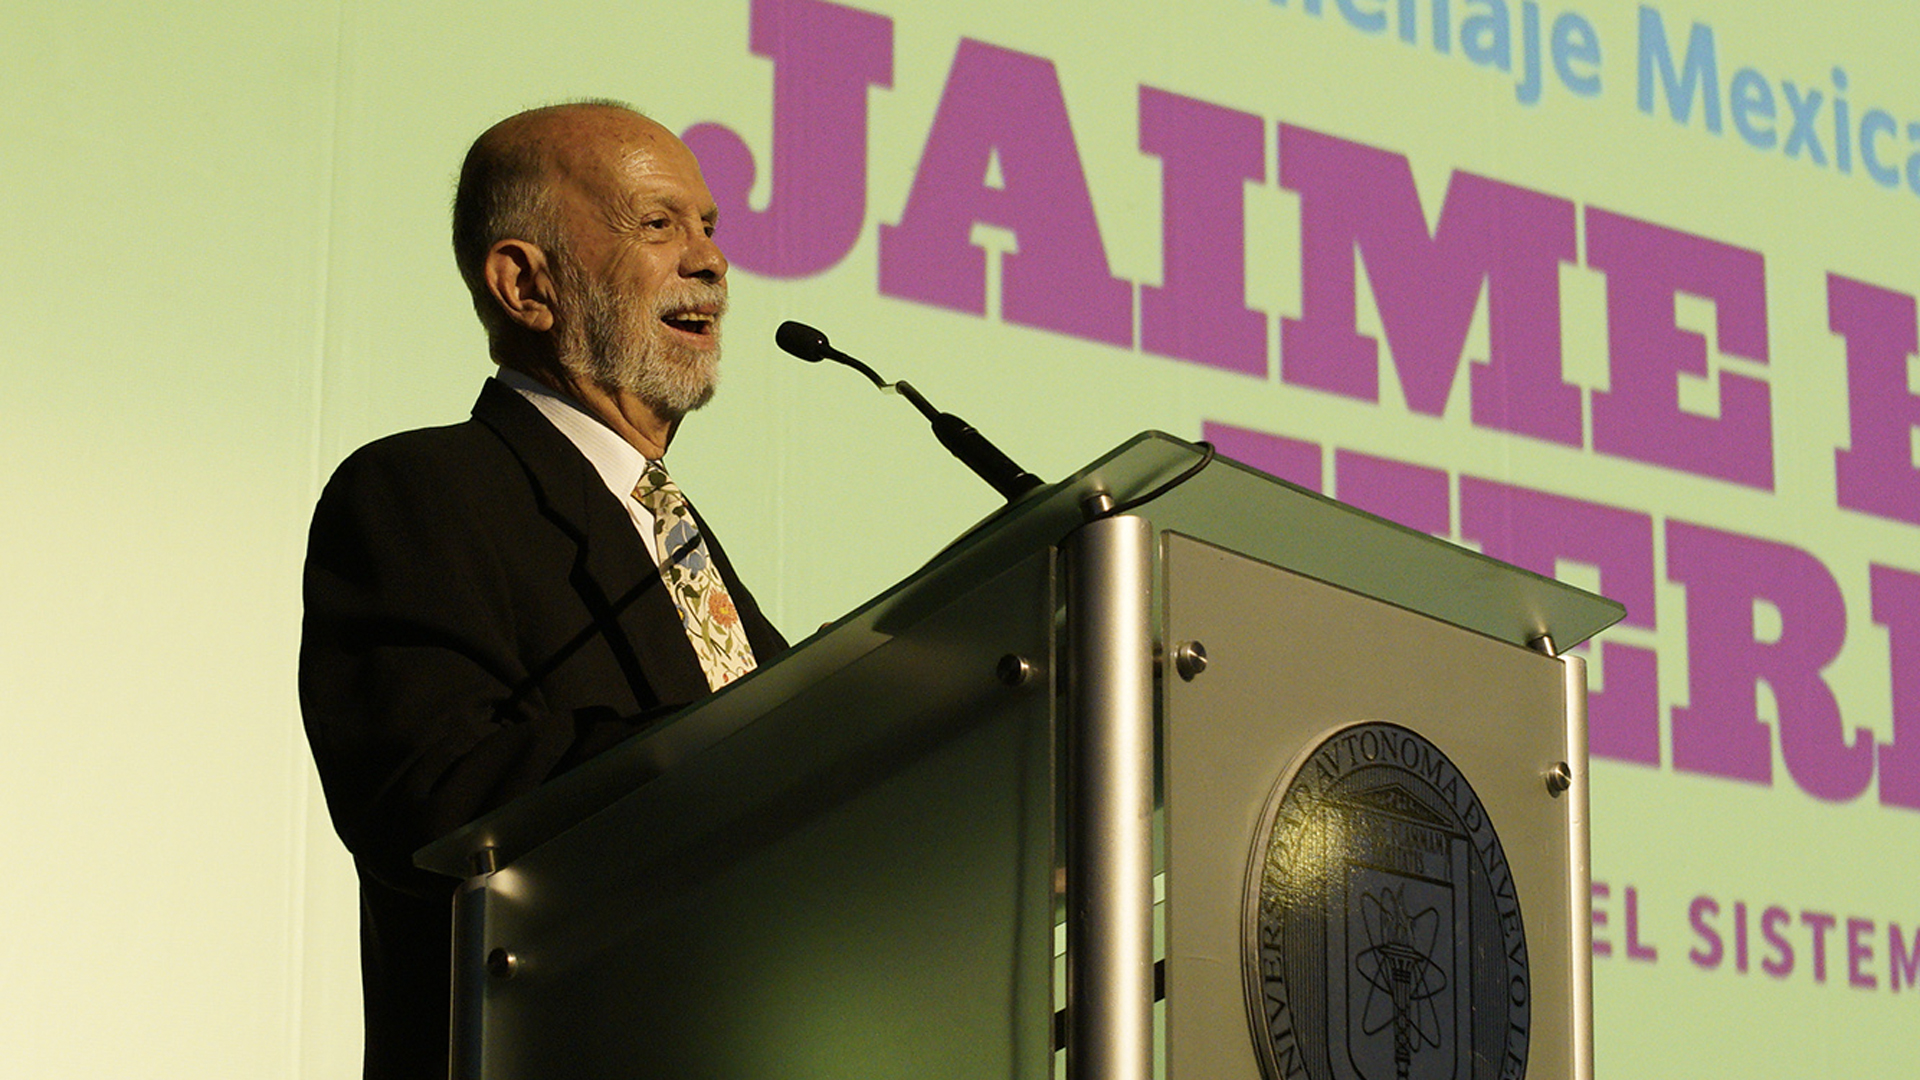 Muere Jaime Humberto Hermosillo, reconocido cineasta mexicano